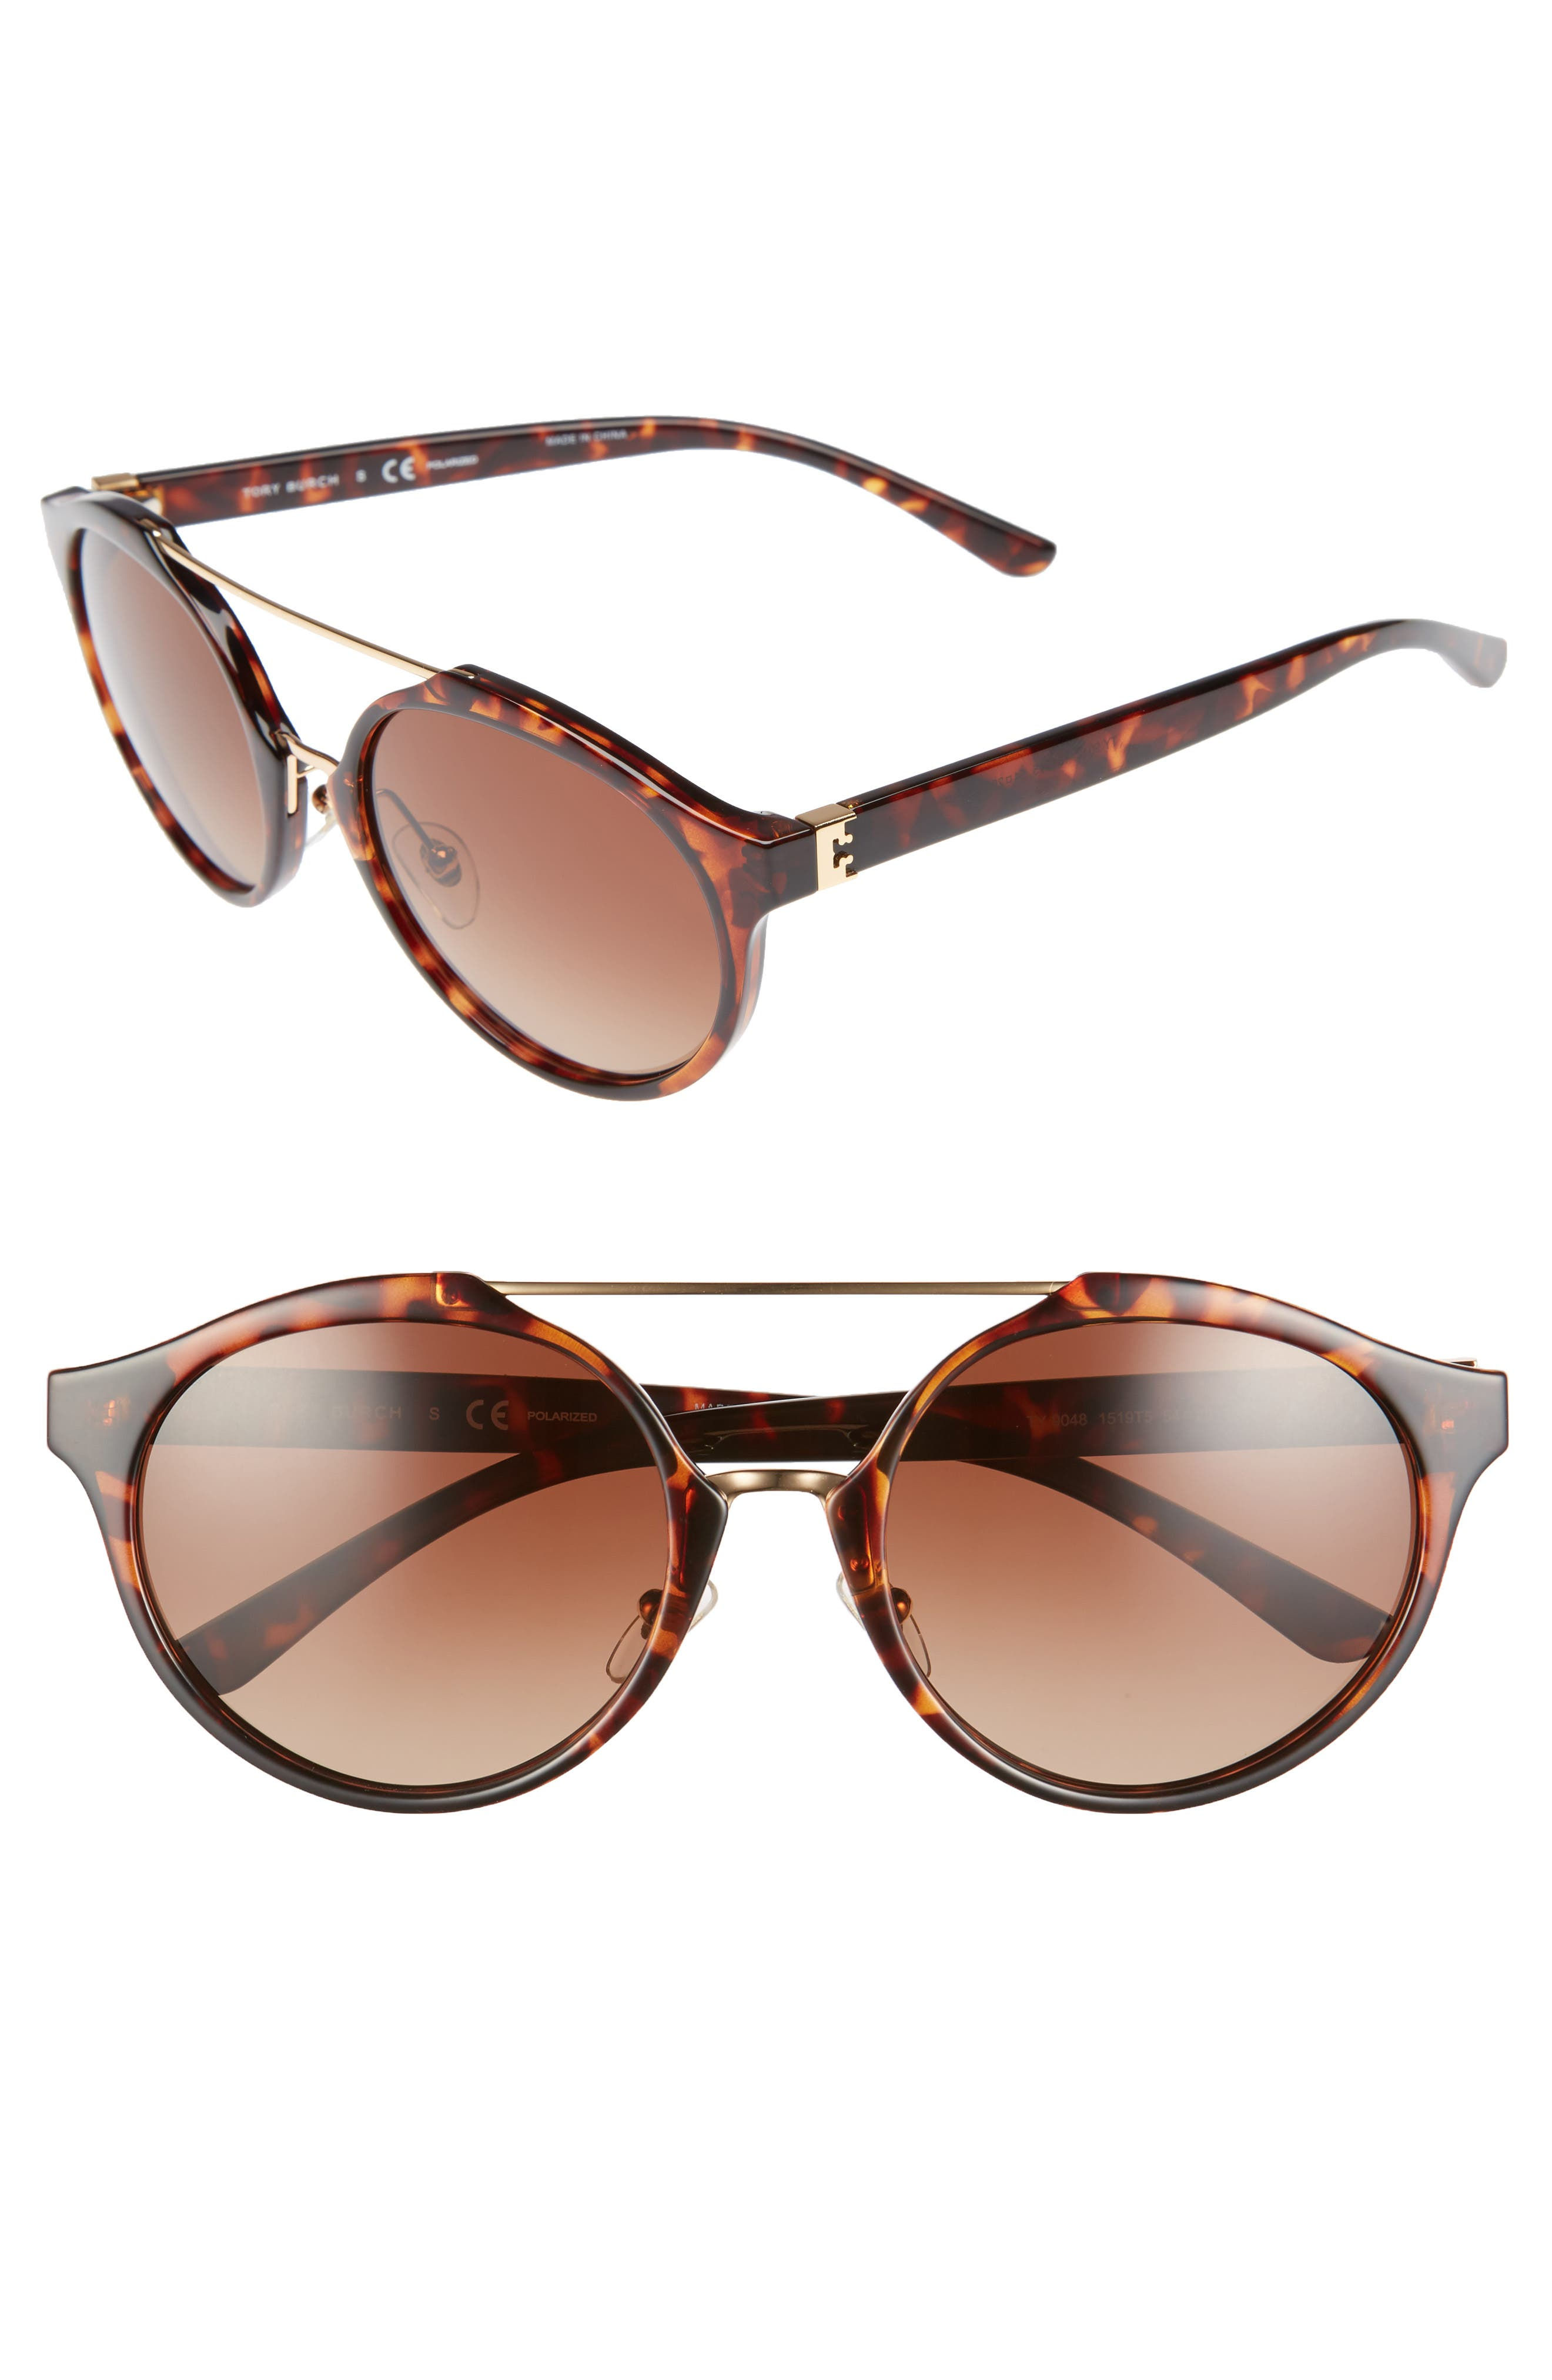 Main Image - Tory Burch 54mm Polarized Sunglasses